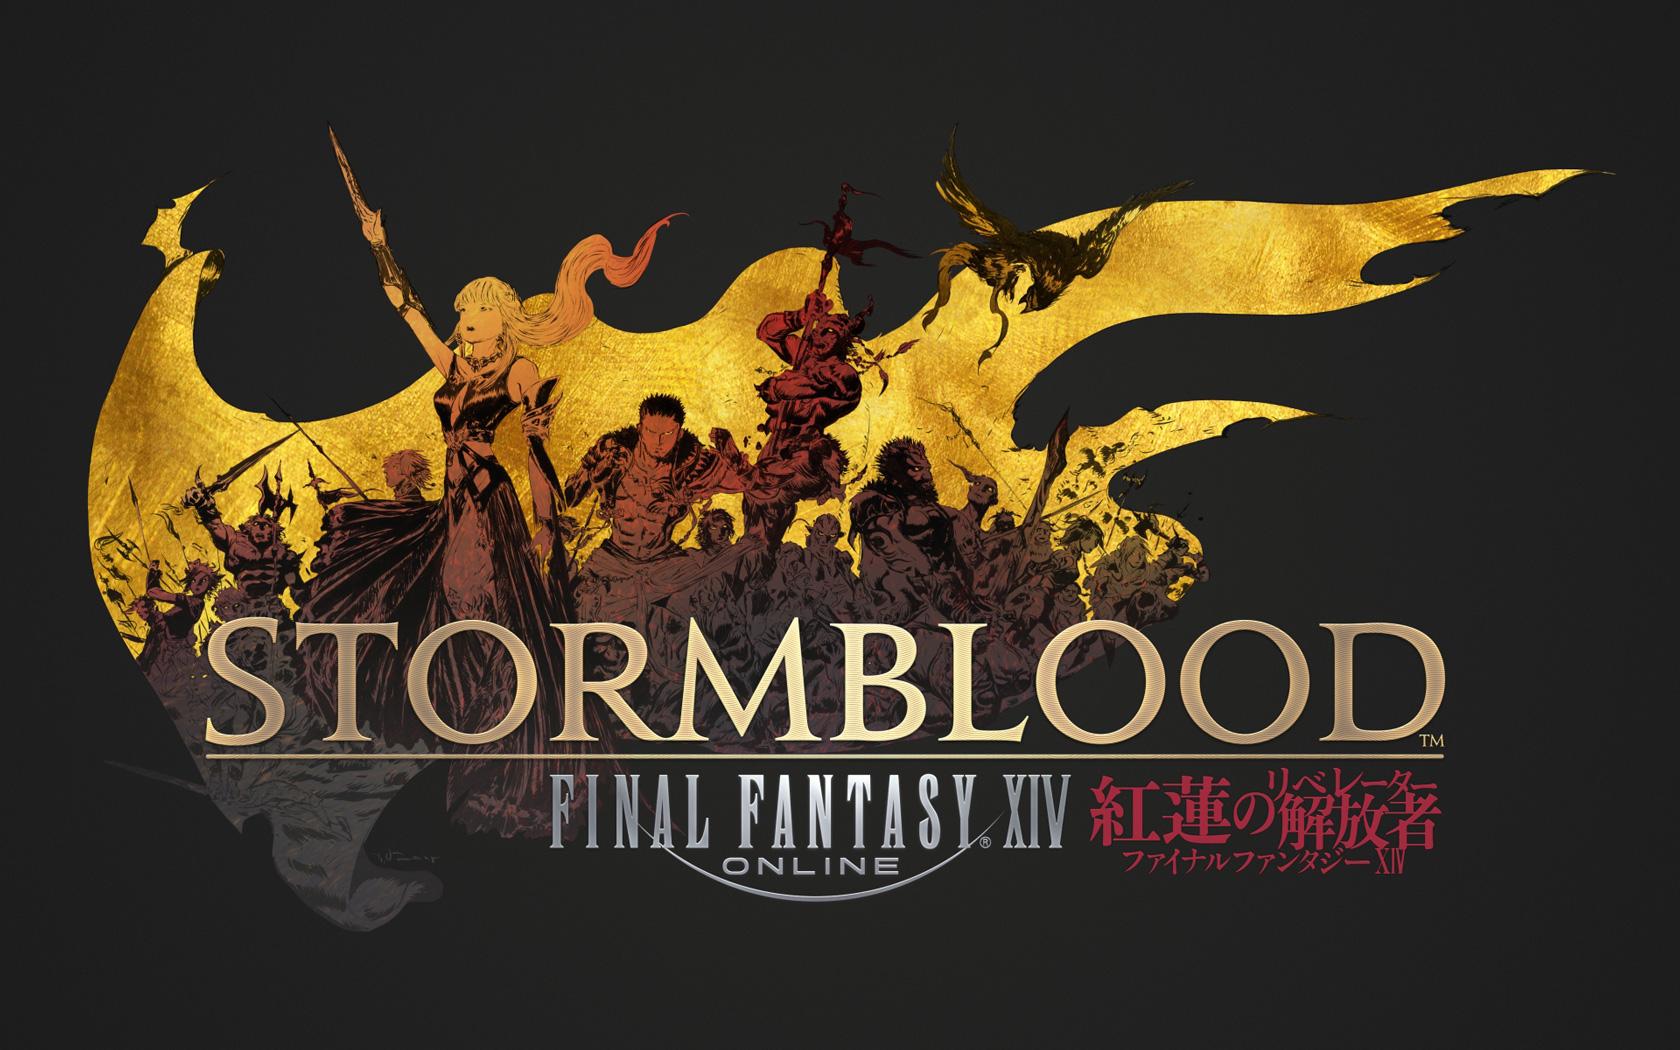 Free Final Fantasy XIV Wallpaper in 1680x1050